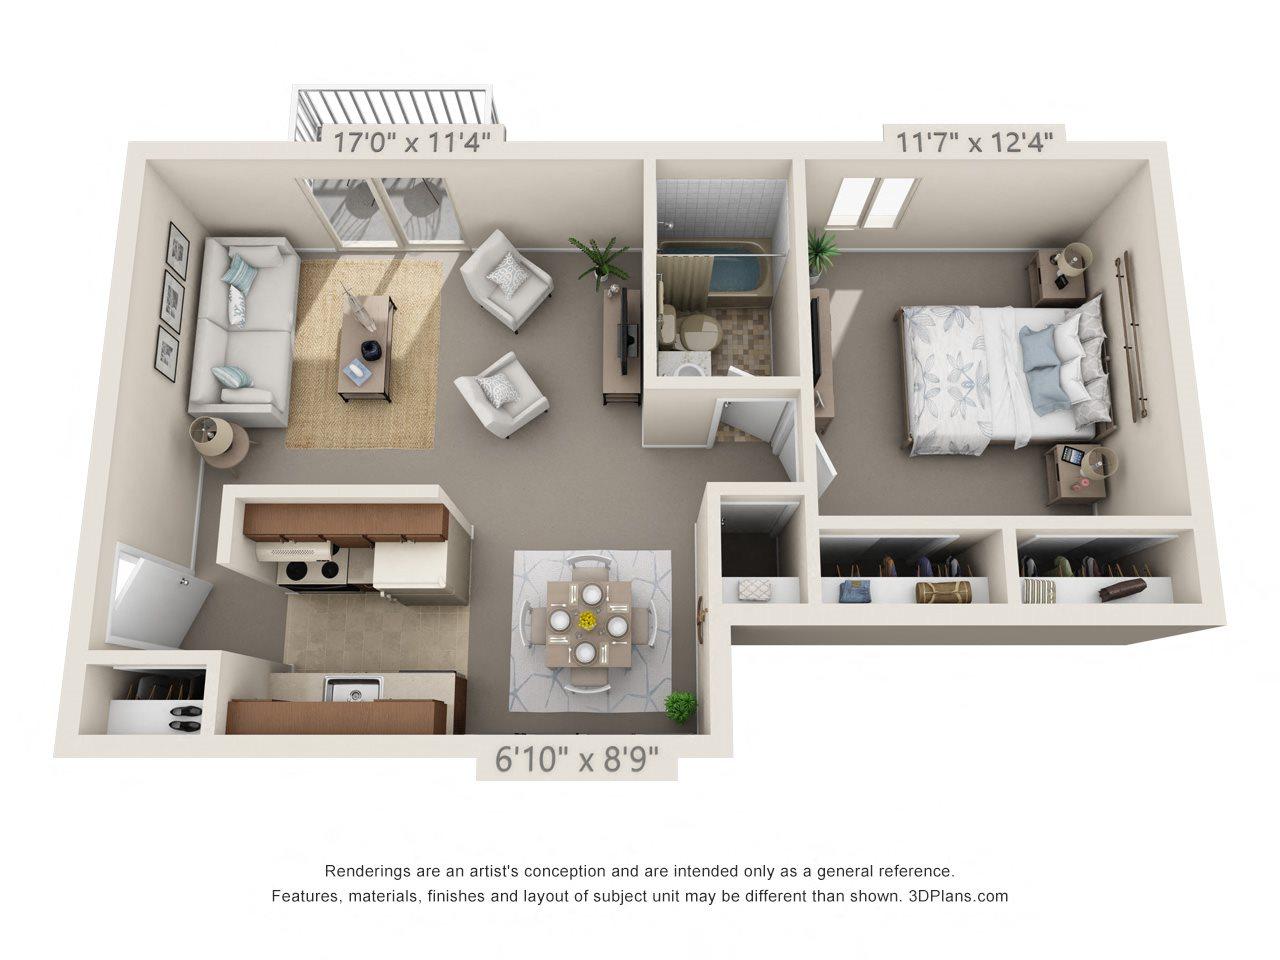 1 Bedroom, 1 Bath (Balcony, Heat Paid) Floor Plan 8